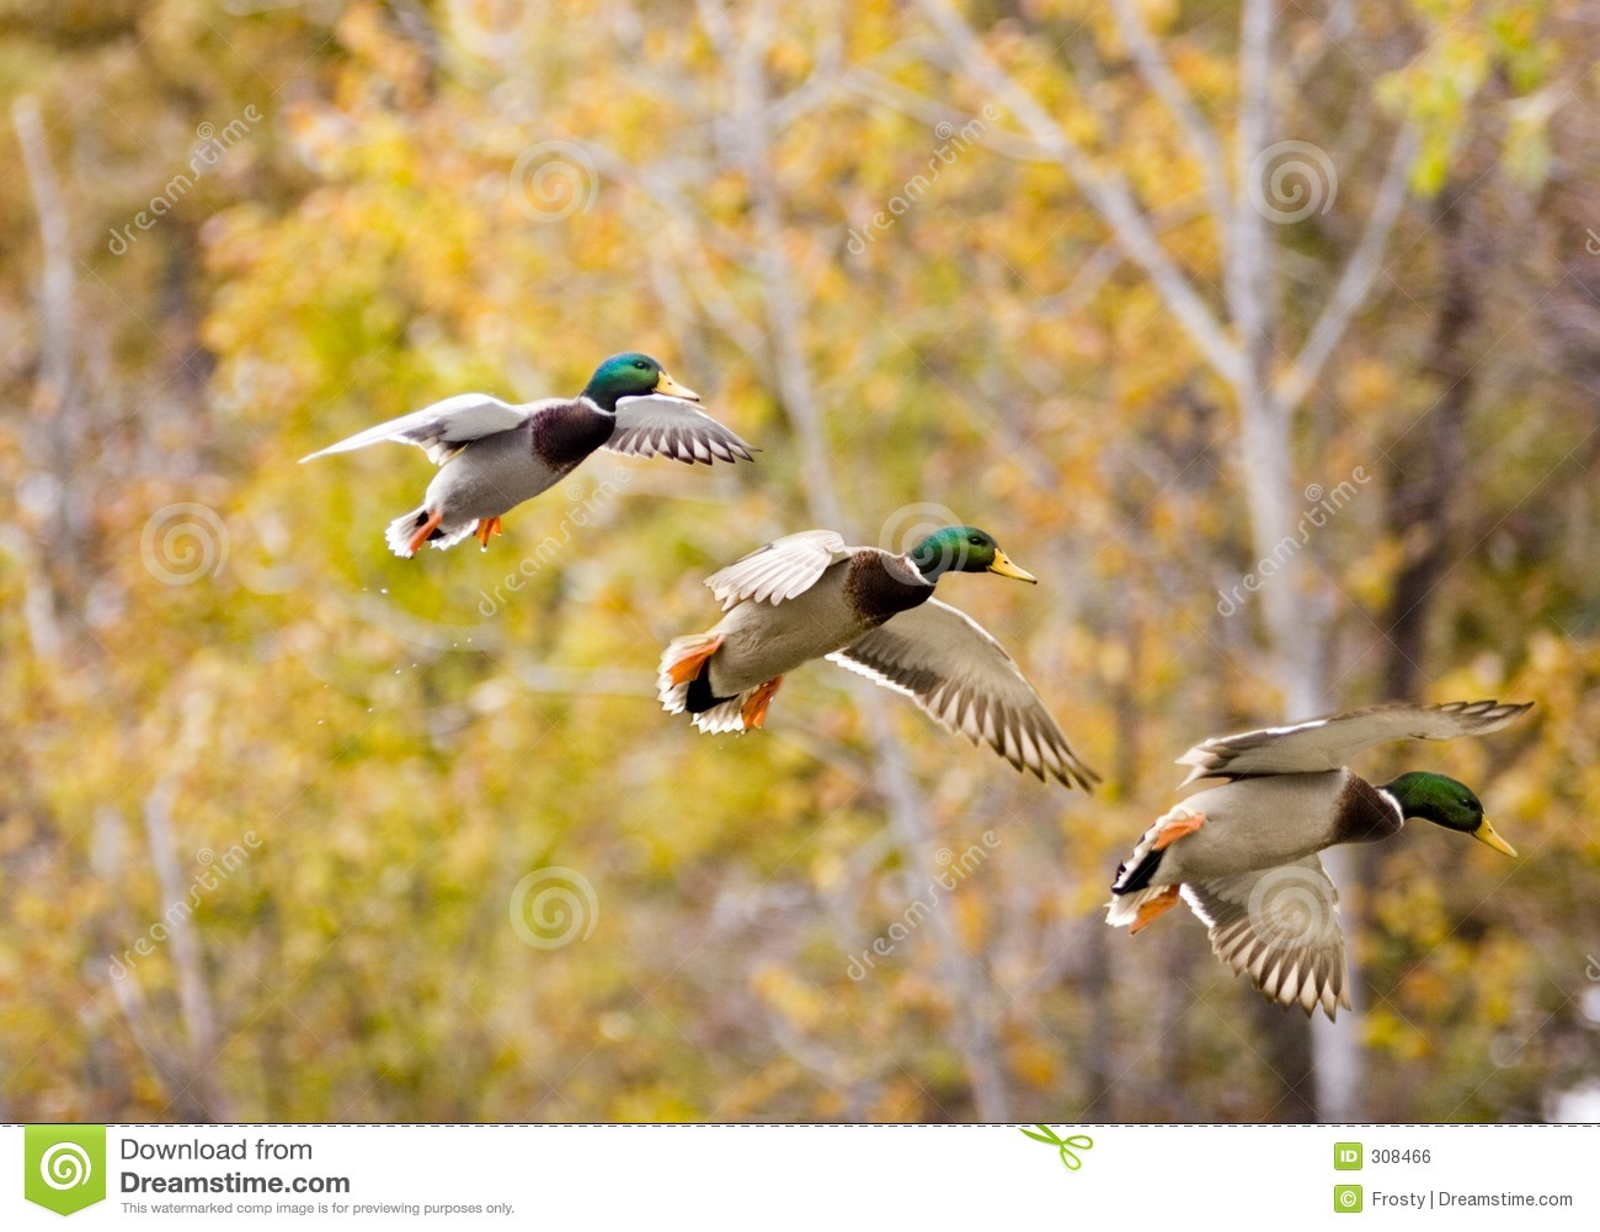 mallard in sequence stock photo image of bird wild